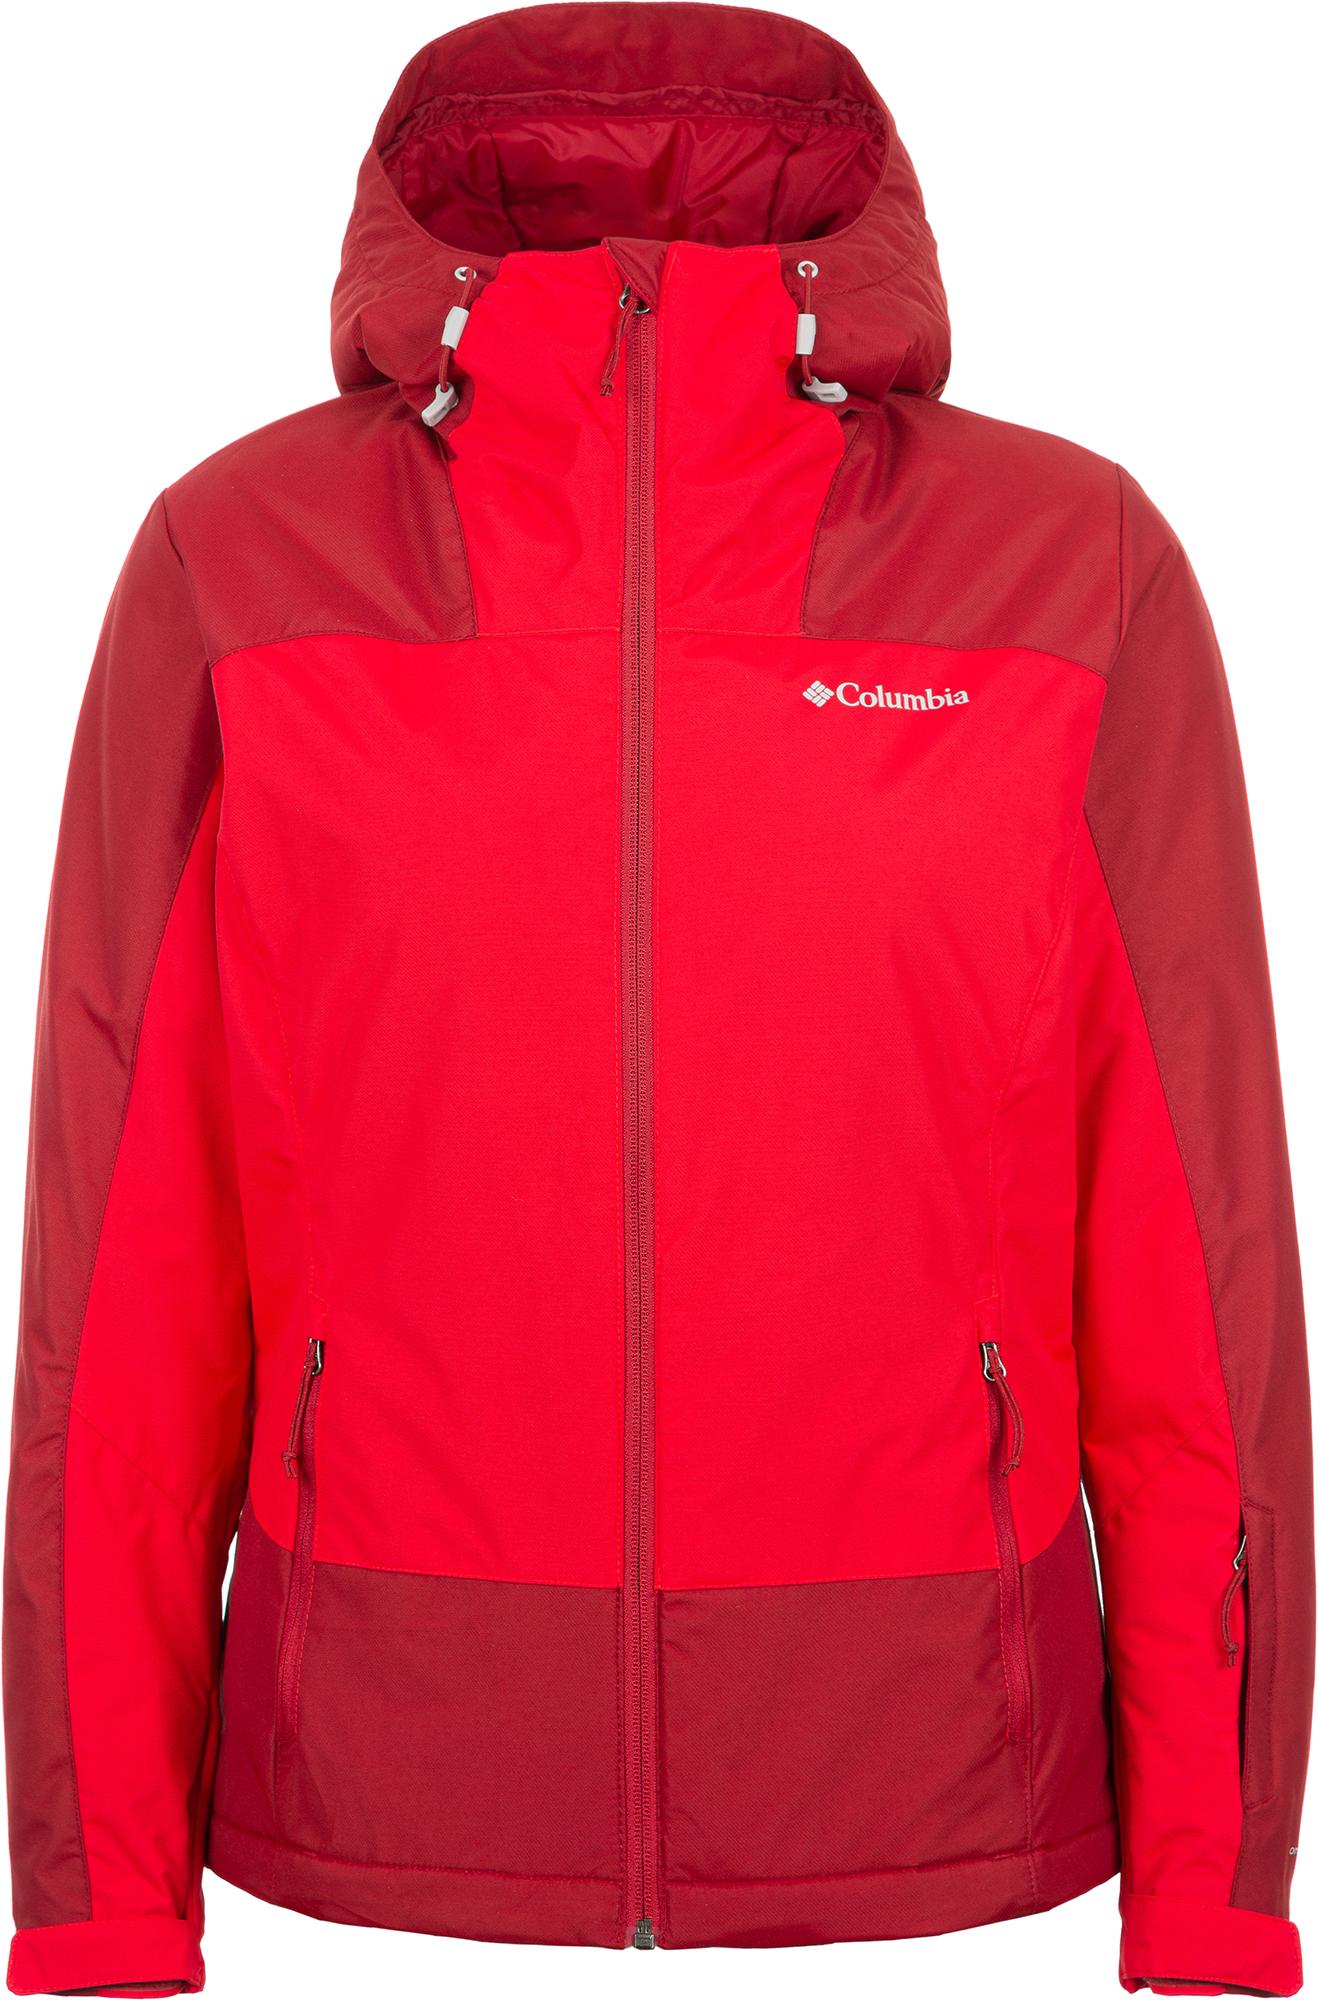 Columbia Куртка утепленная женская Columbia Berryville Bay, размер 46 цена и фото